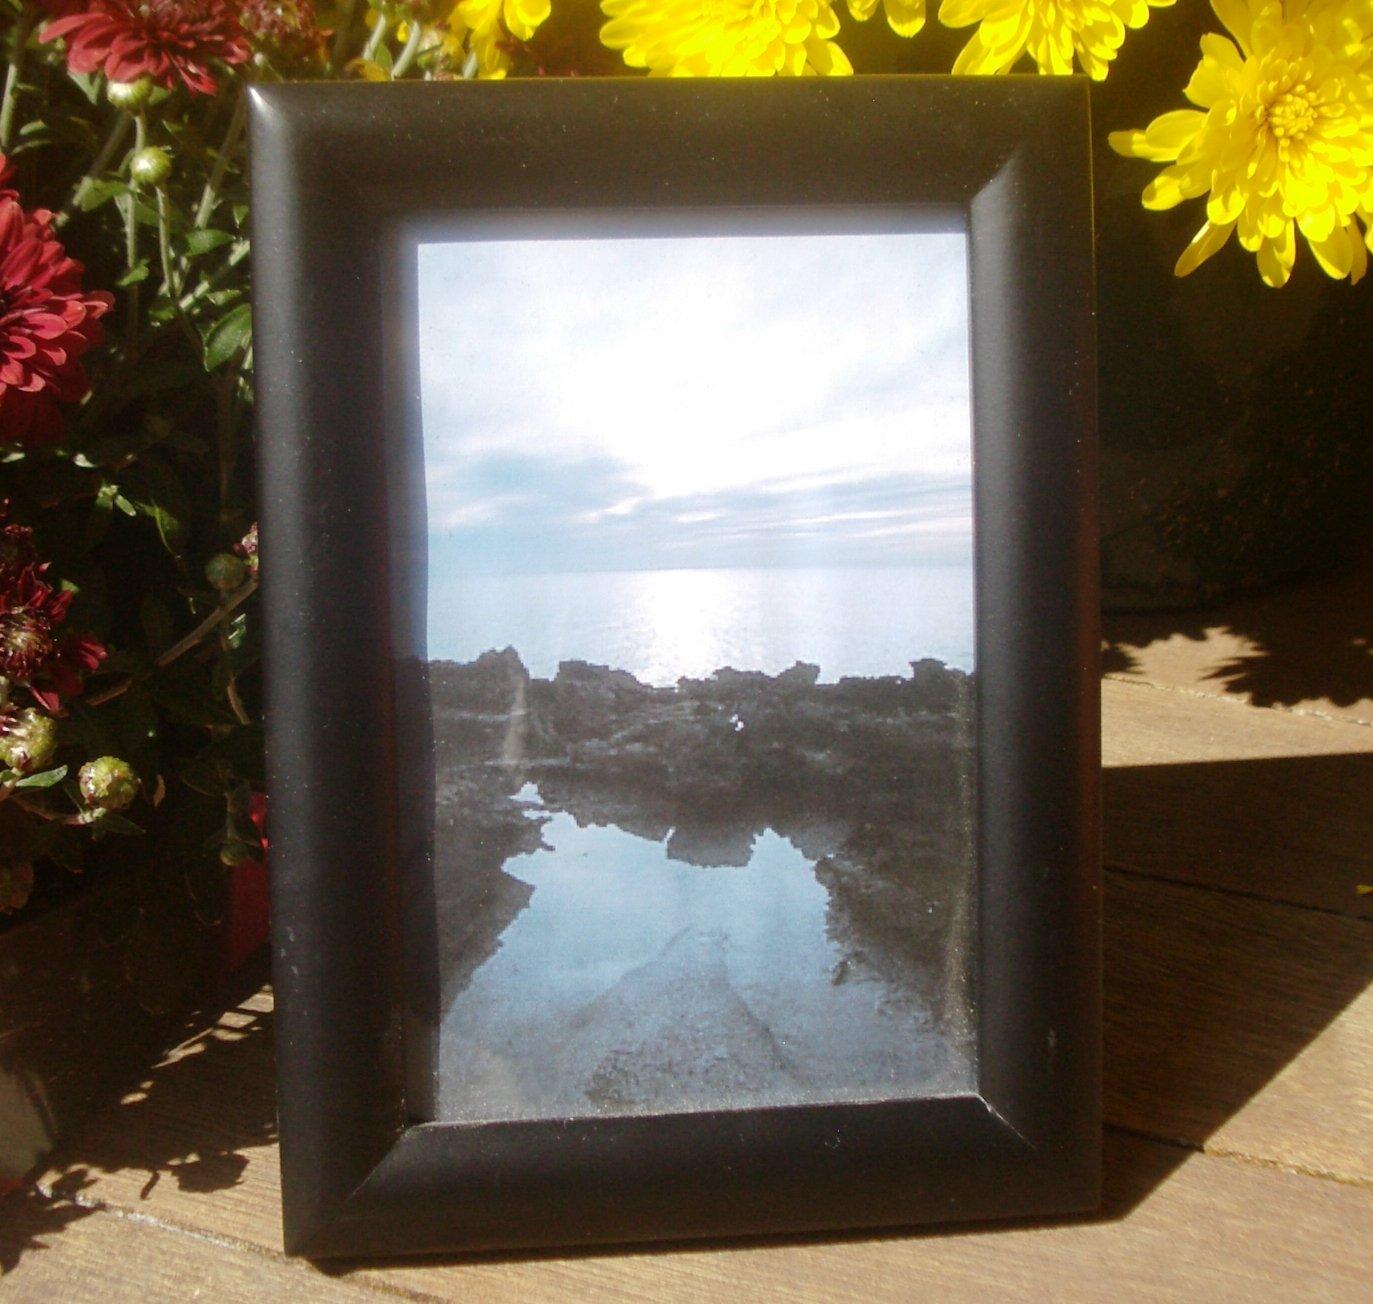 "Simple Black Wooden Picture Frame 3 1/2"" x 5 1/2"" Inside Measurement"